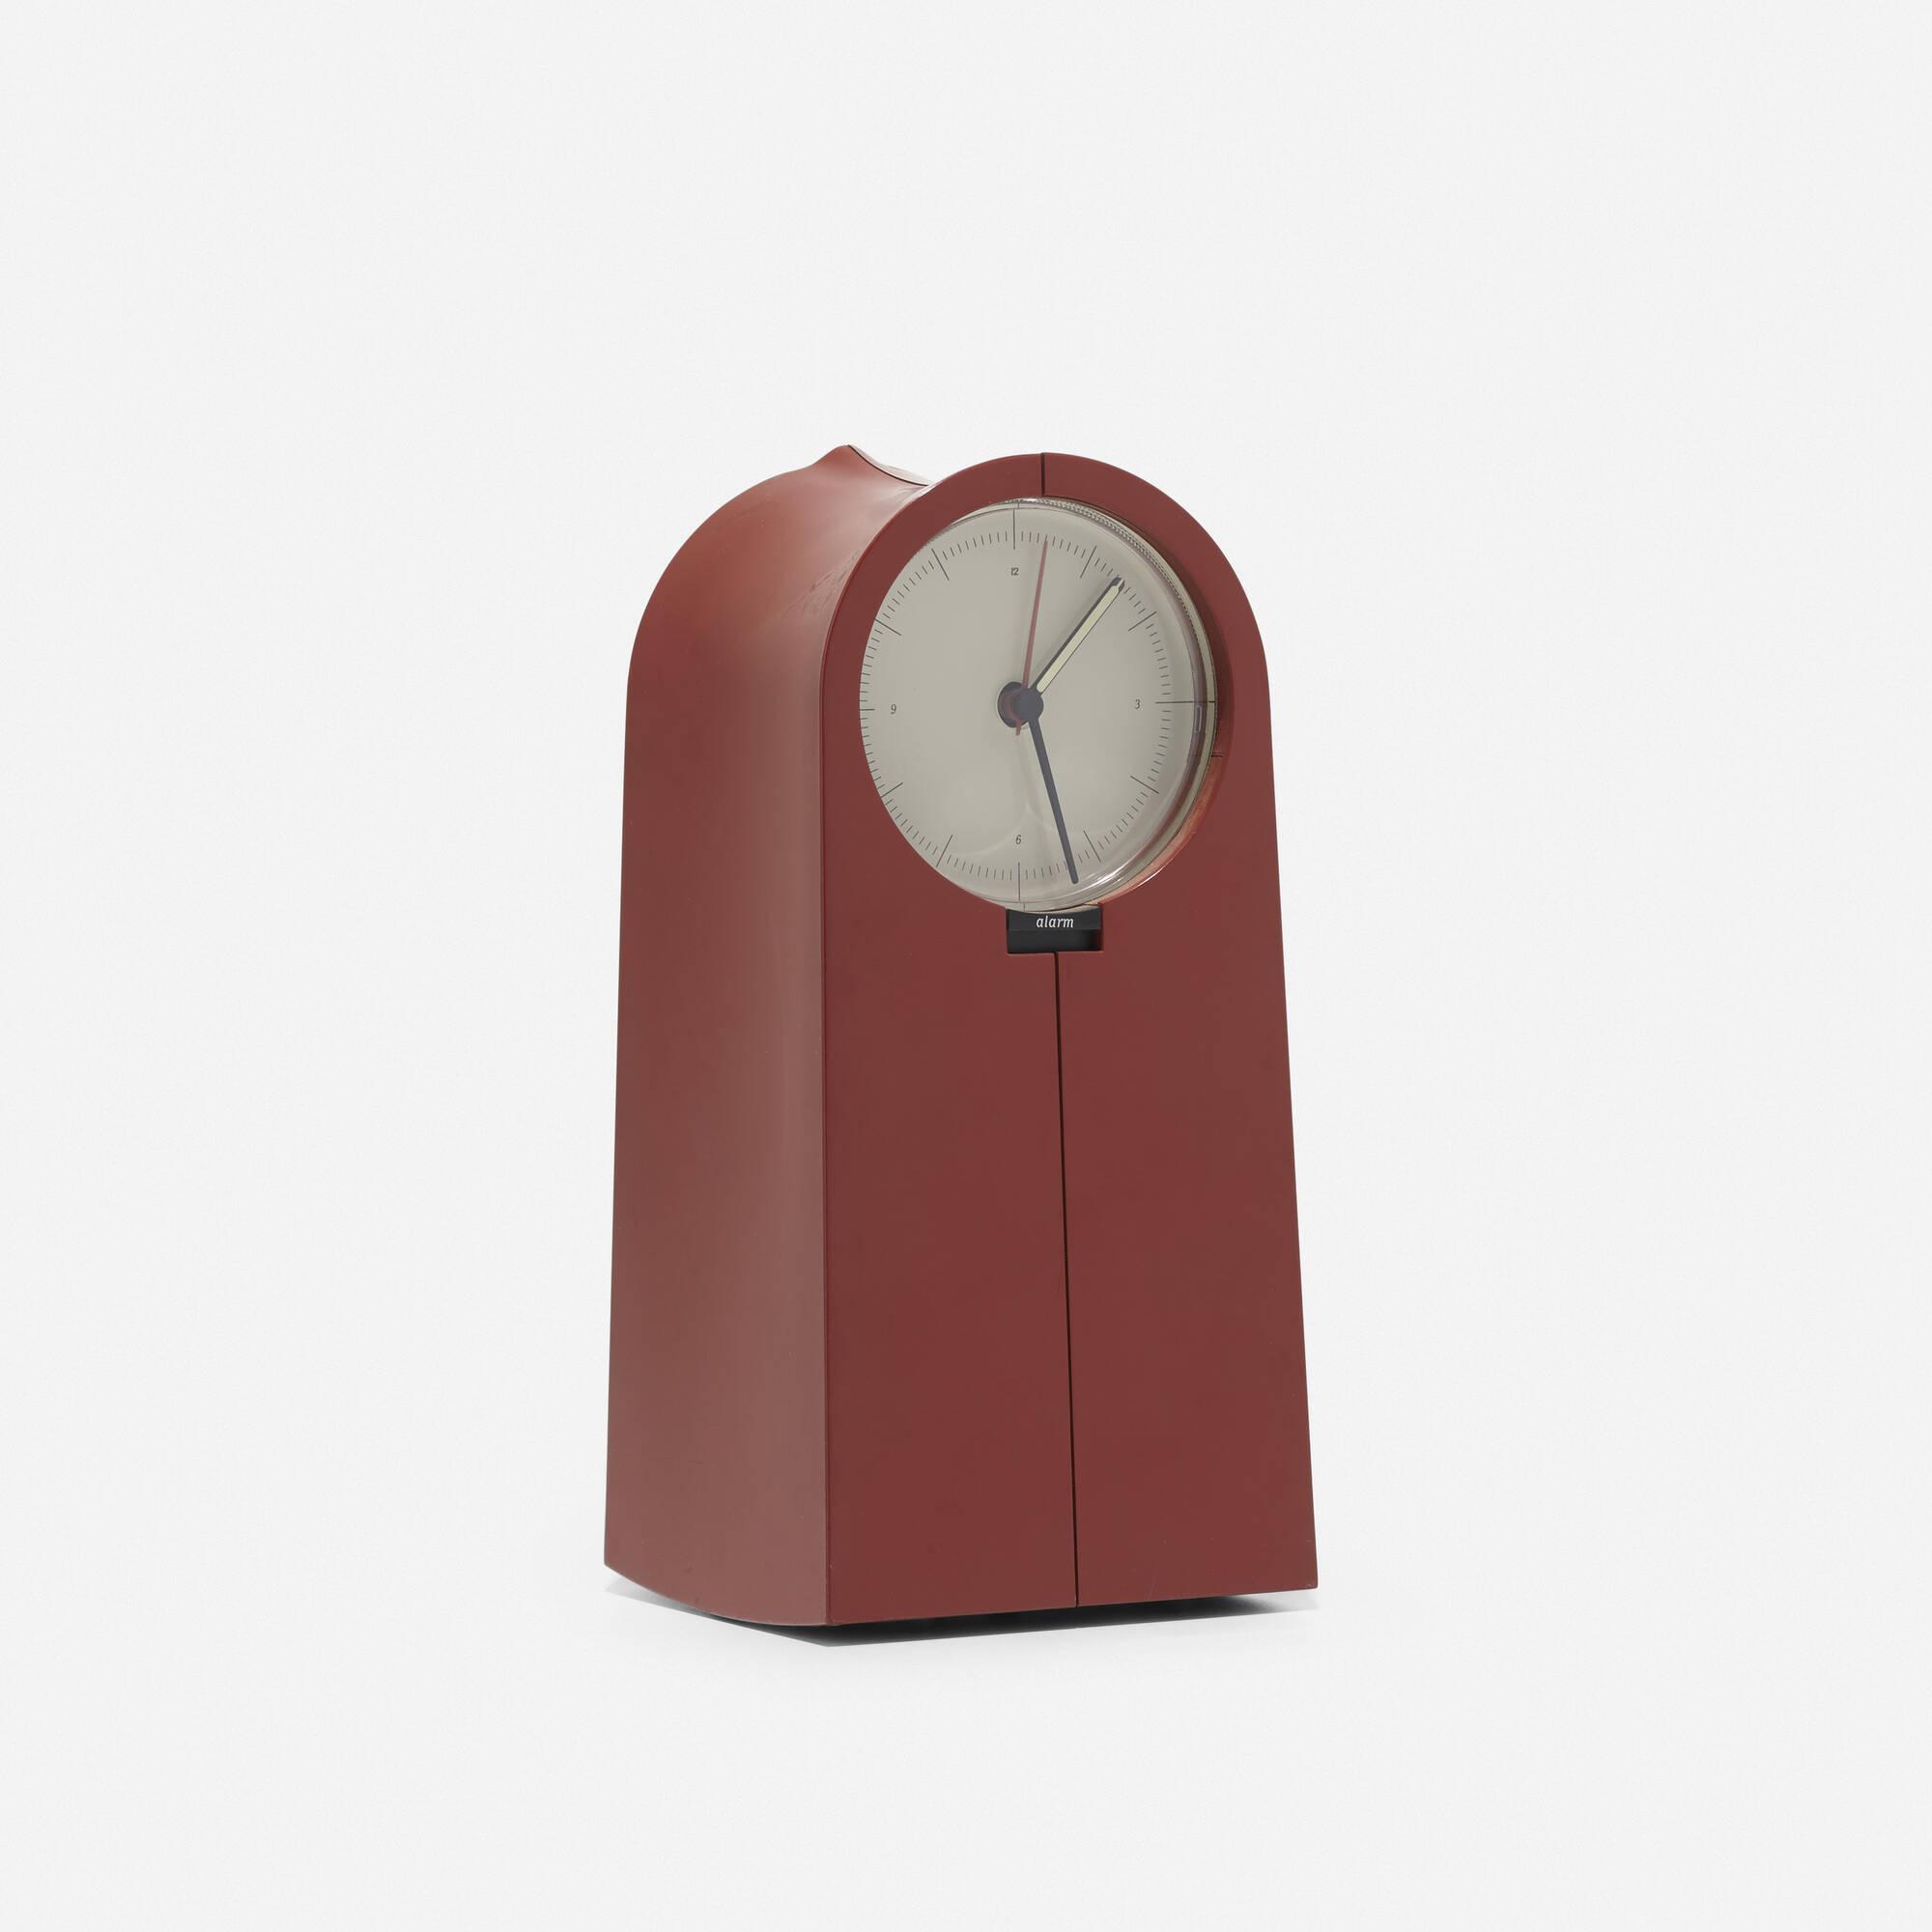 272: Philippe Starck / Coo Coo radio alarm clock (1 of 3)